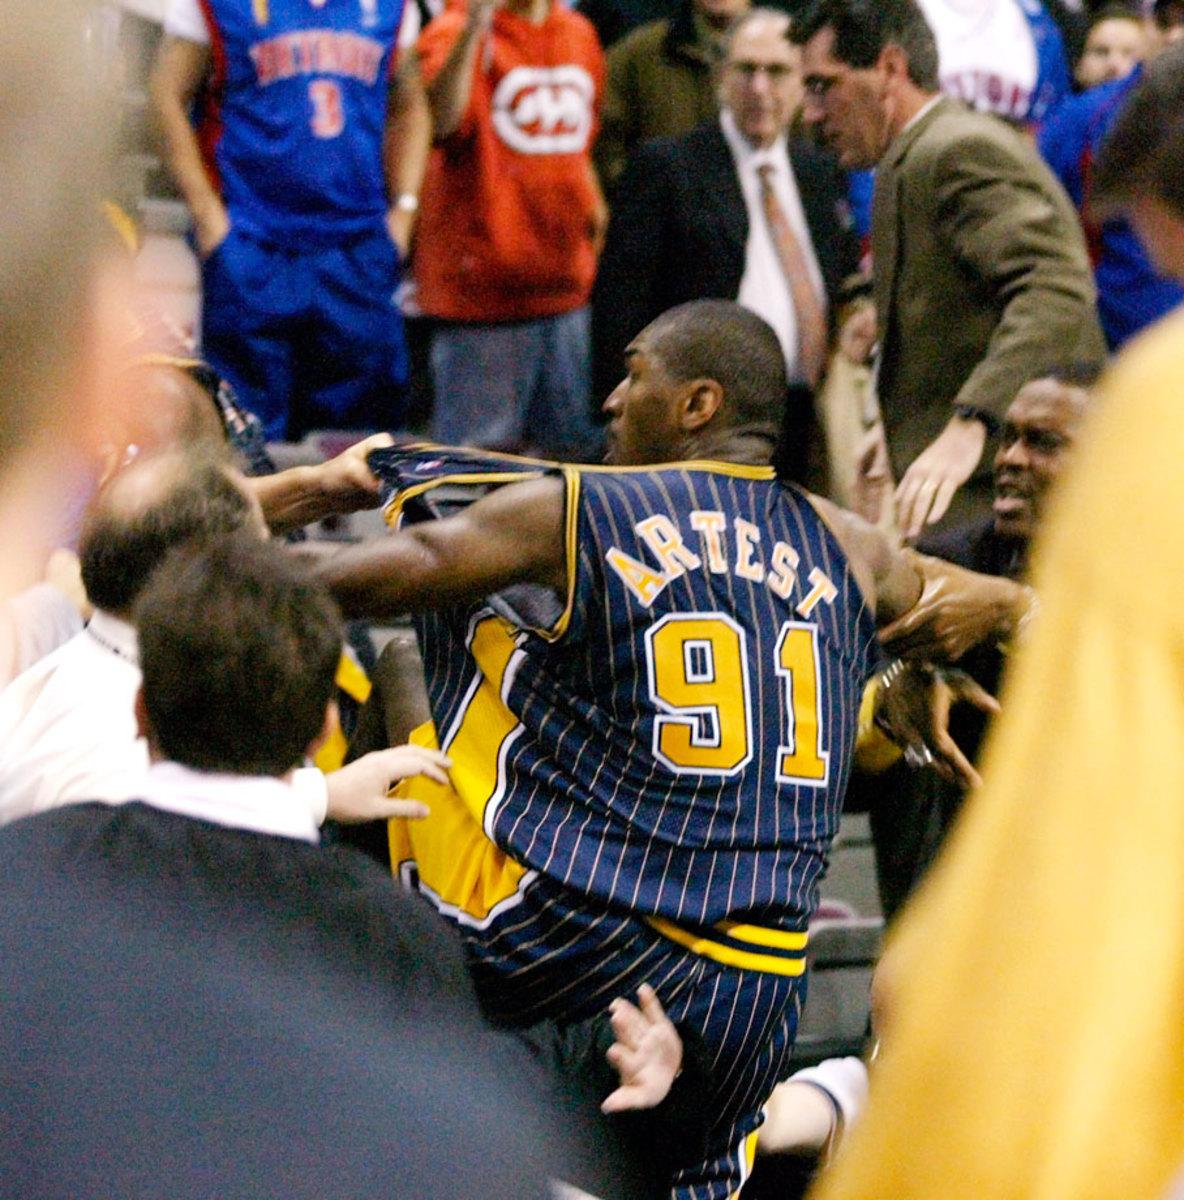 Ron-Artest-fighting-fans(2).jpg